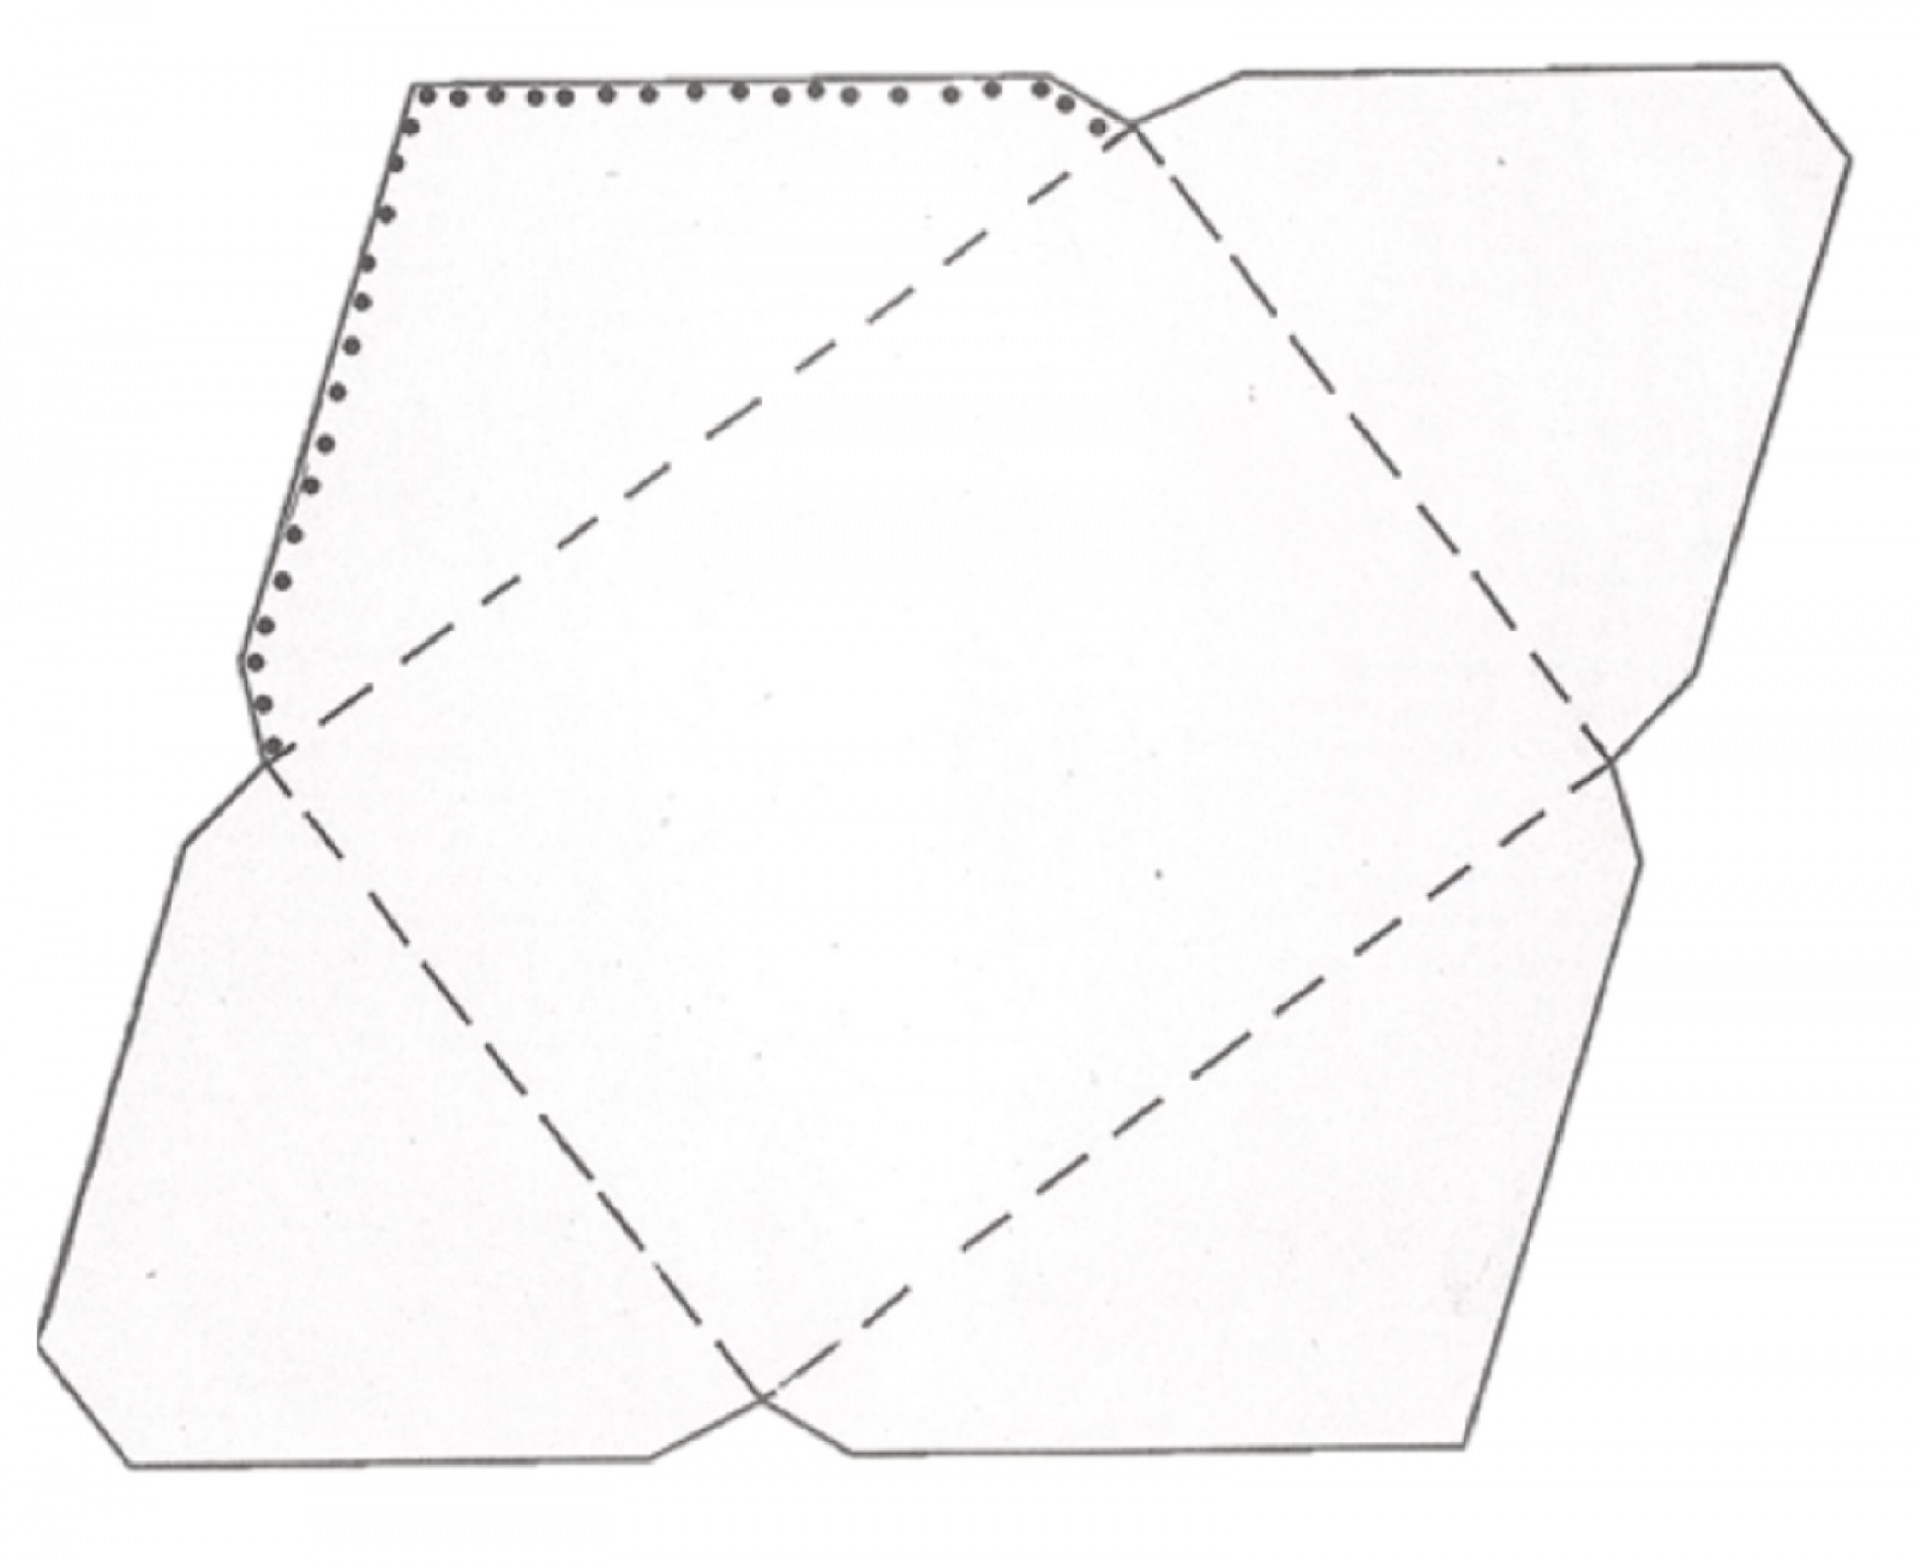 001 Top 5x7 Envelope Template Word Image  Microsoft Free1920